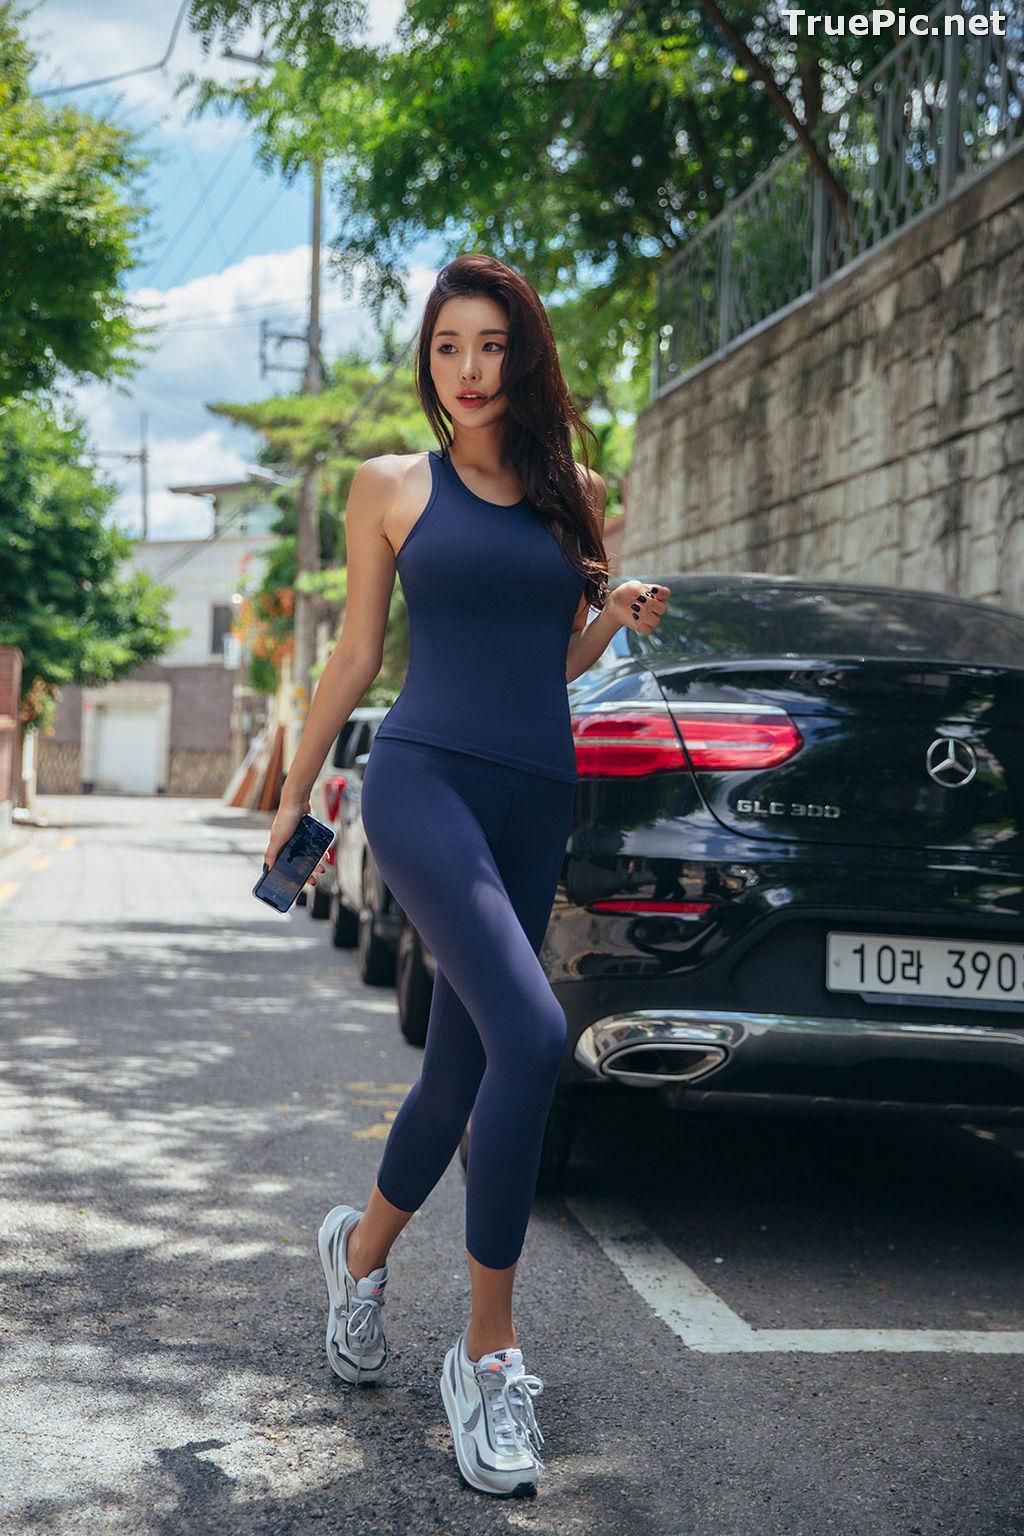 Image Korean Fashion Model - Park Da Hyun - Navy Sportswear - TruePic.net - Picture-3